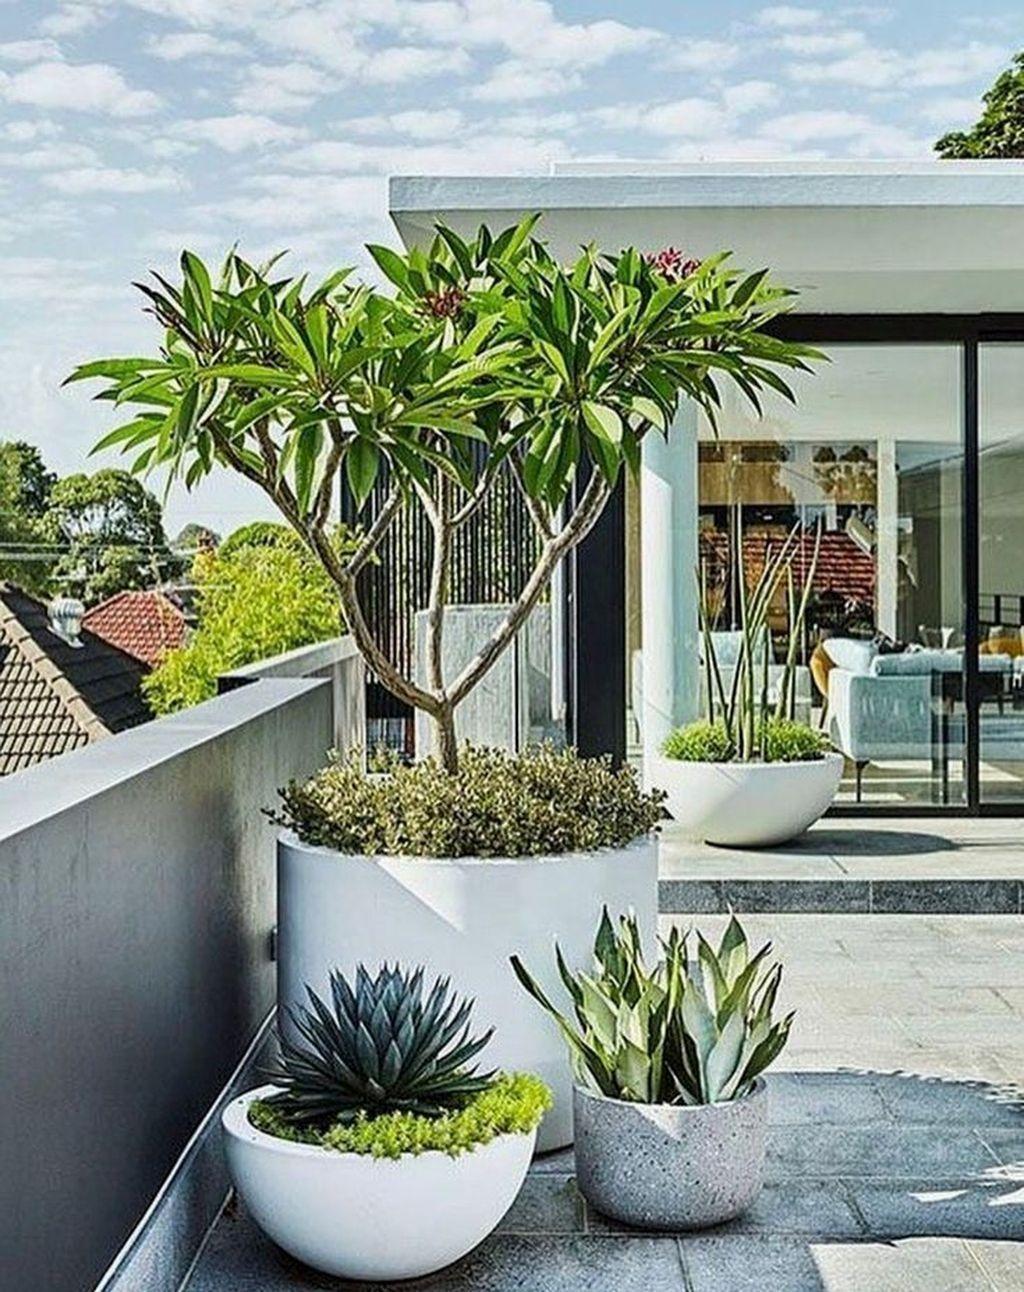 Pin by Lilou Blanchard on interieur | Modern garden design